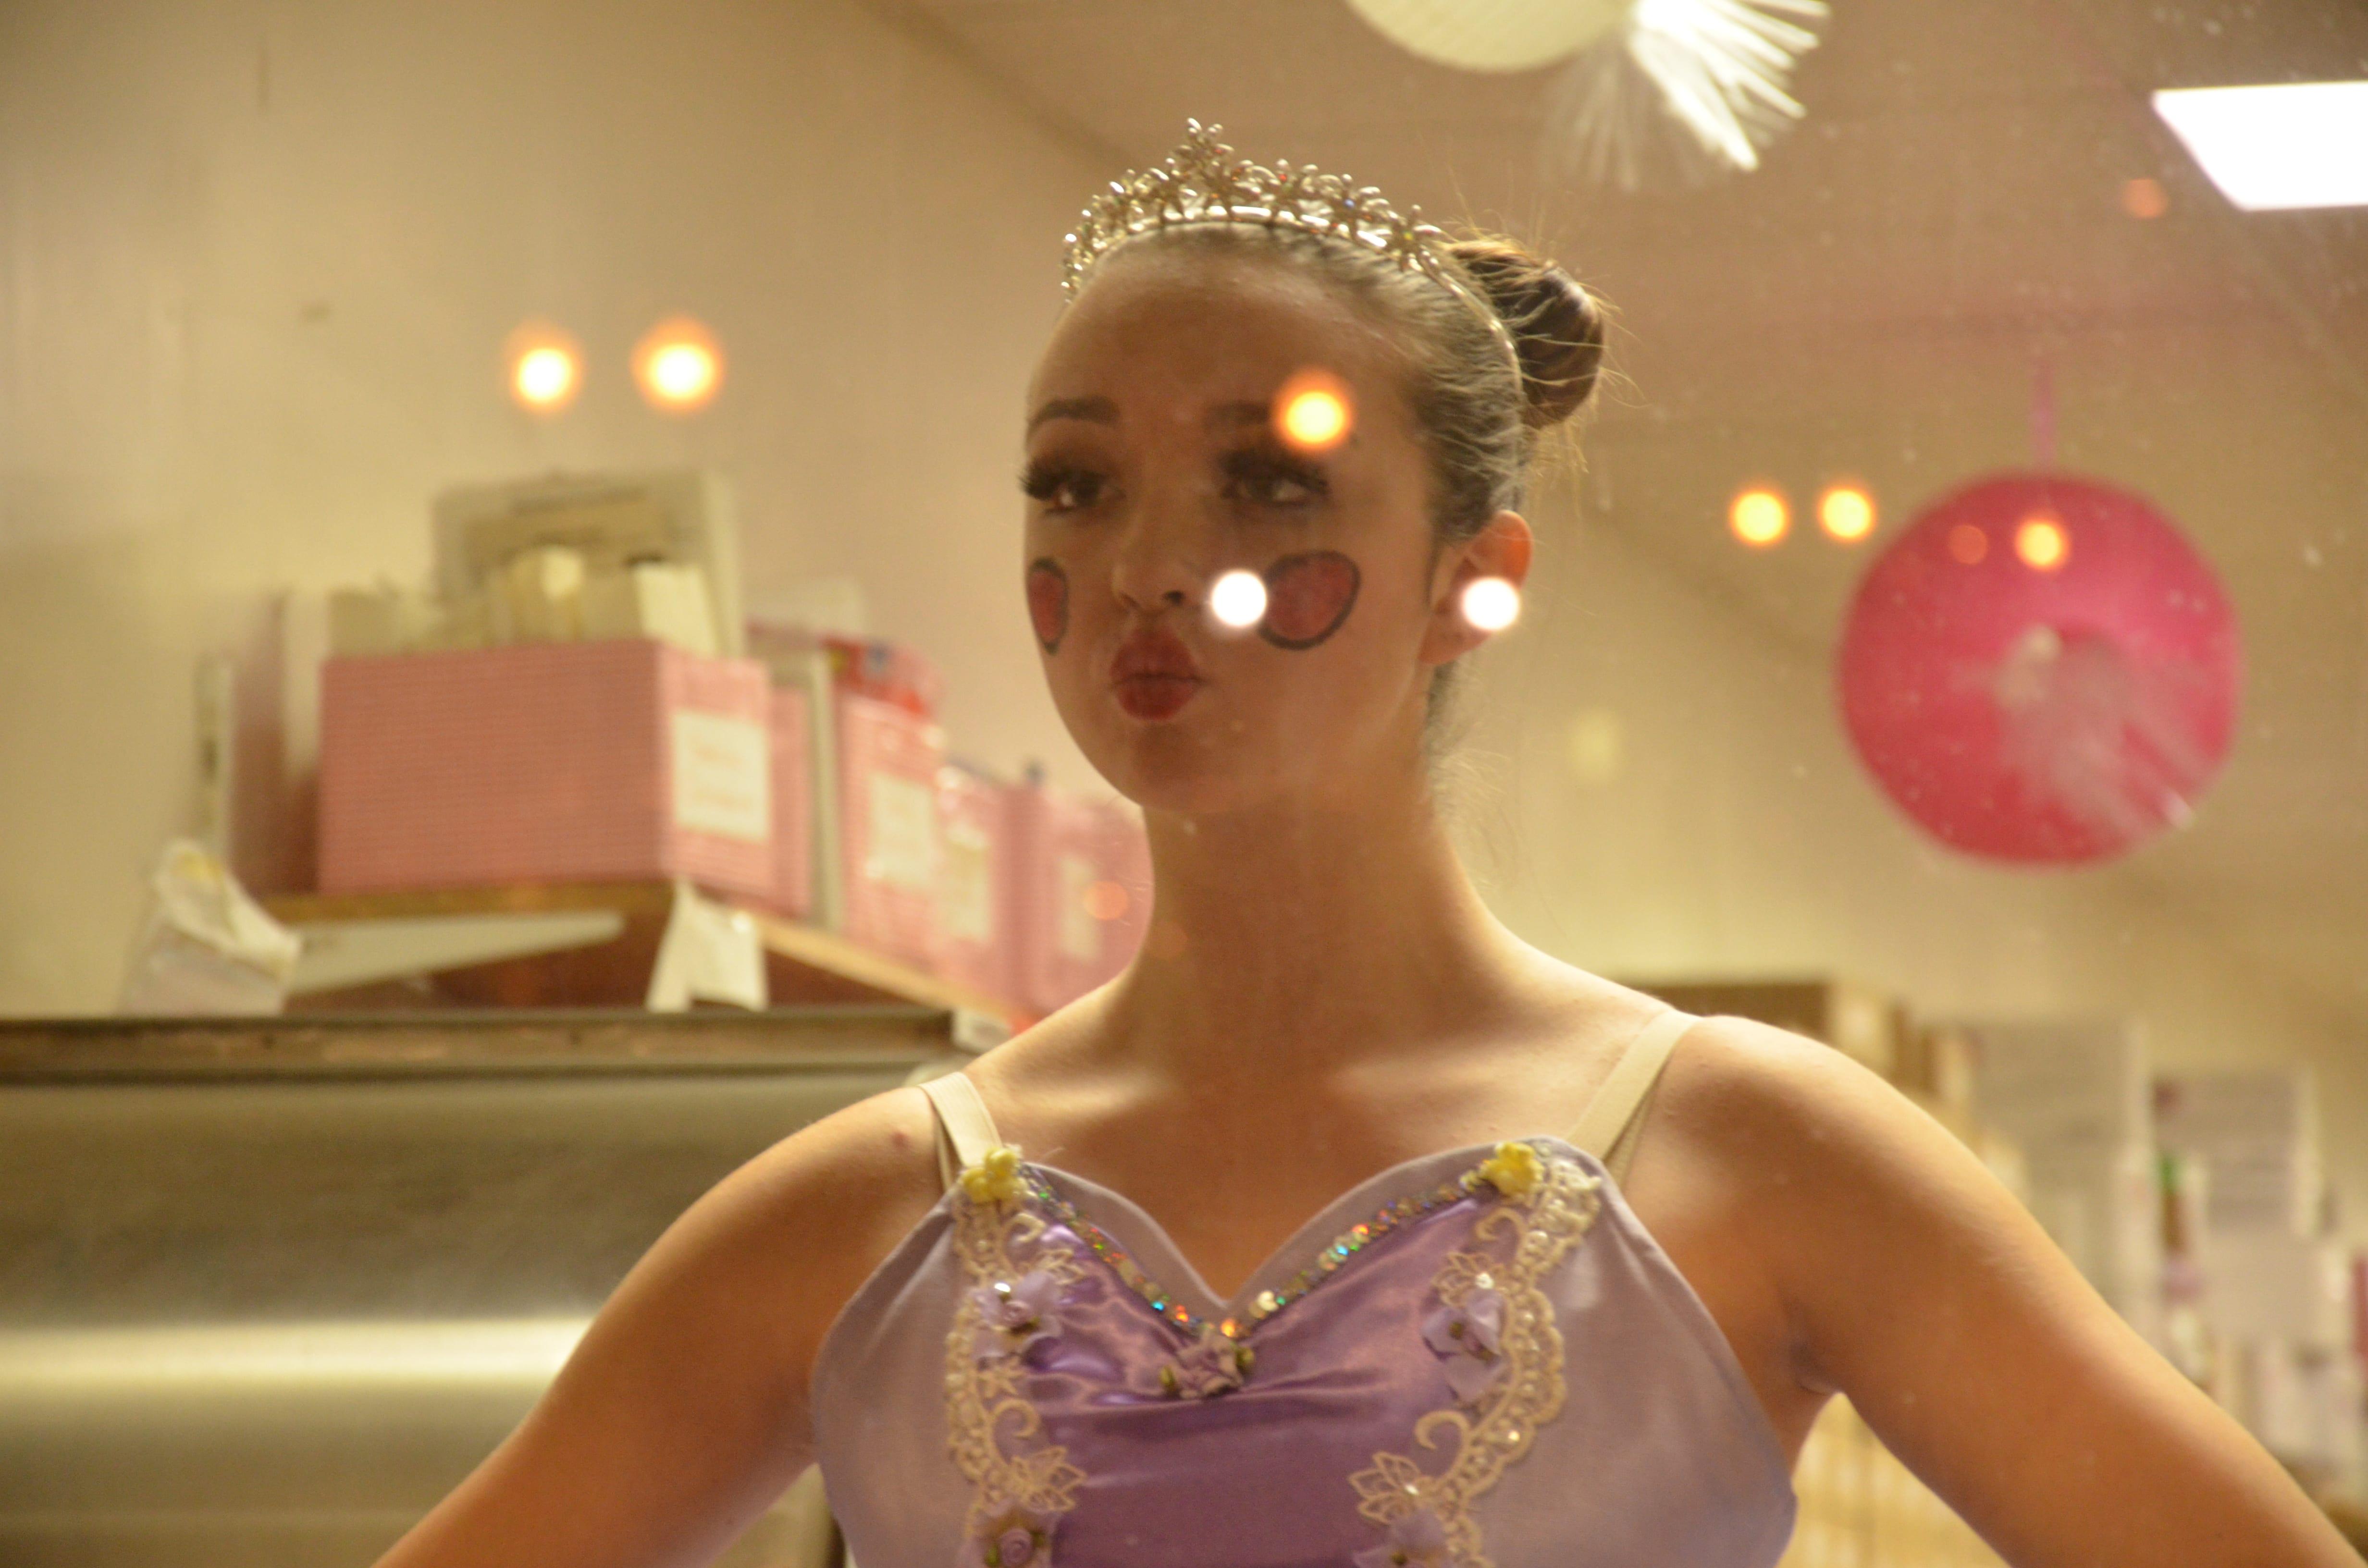 050 – Beth Fowler School of Dance : Genoa and St. Charles Illinois